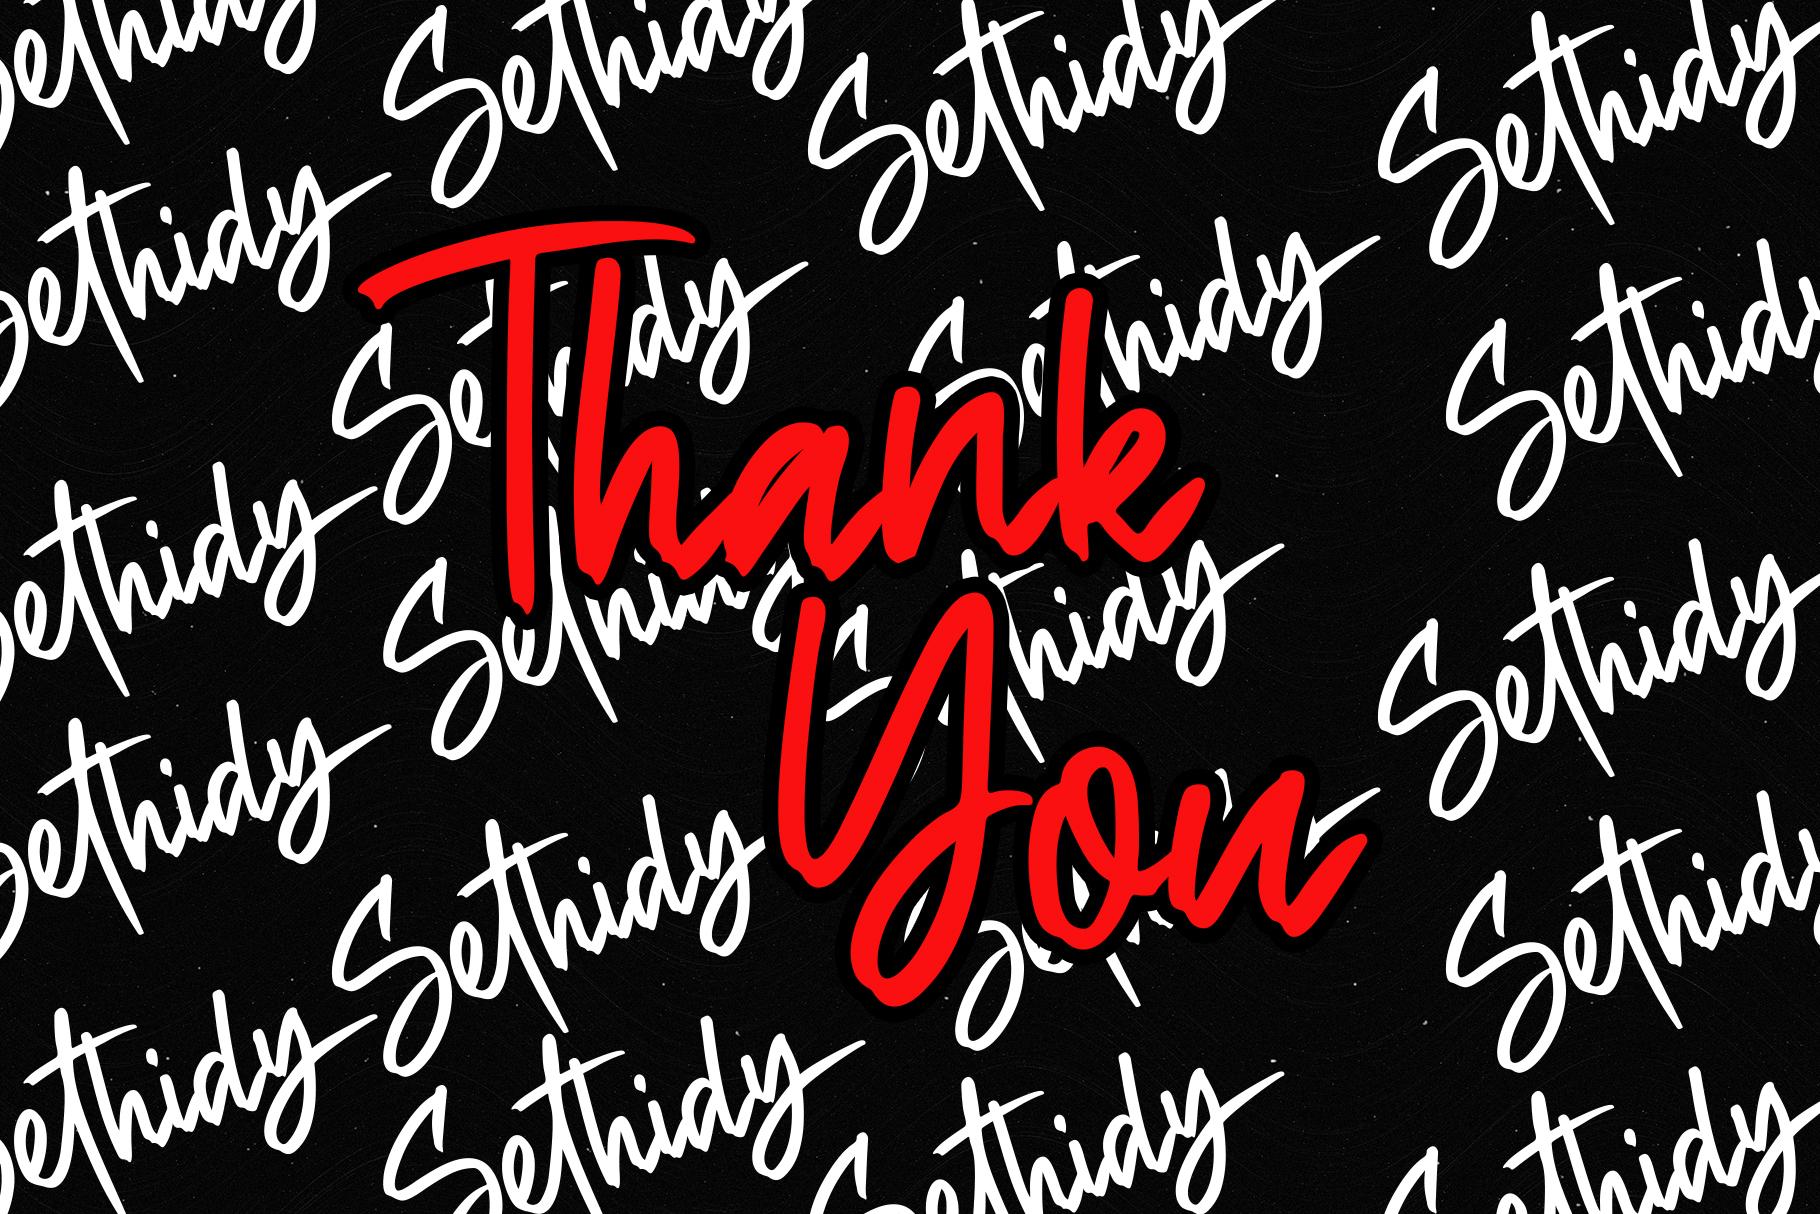 Sethidy - Handwritten Font example image 9